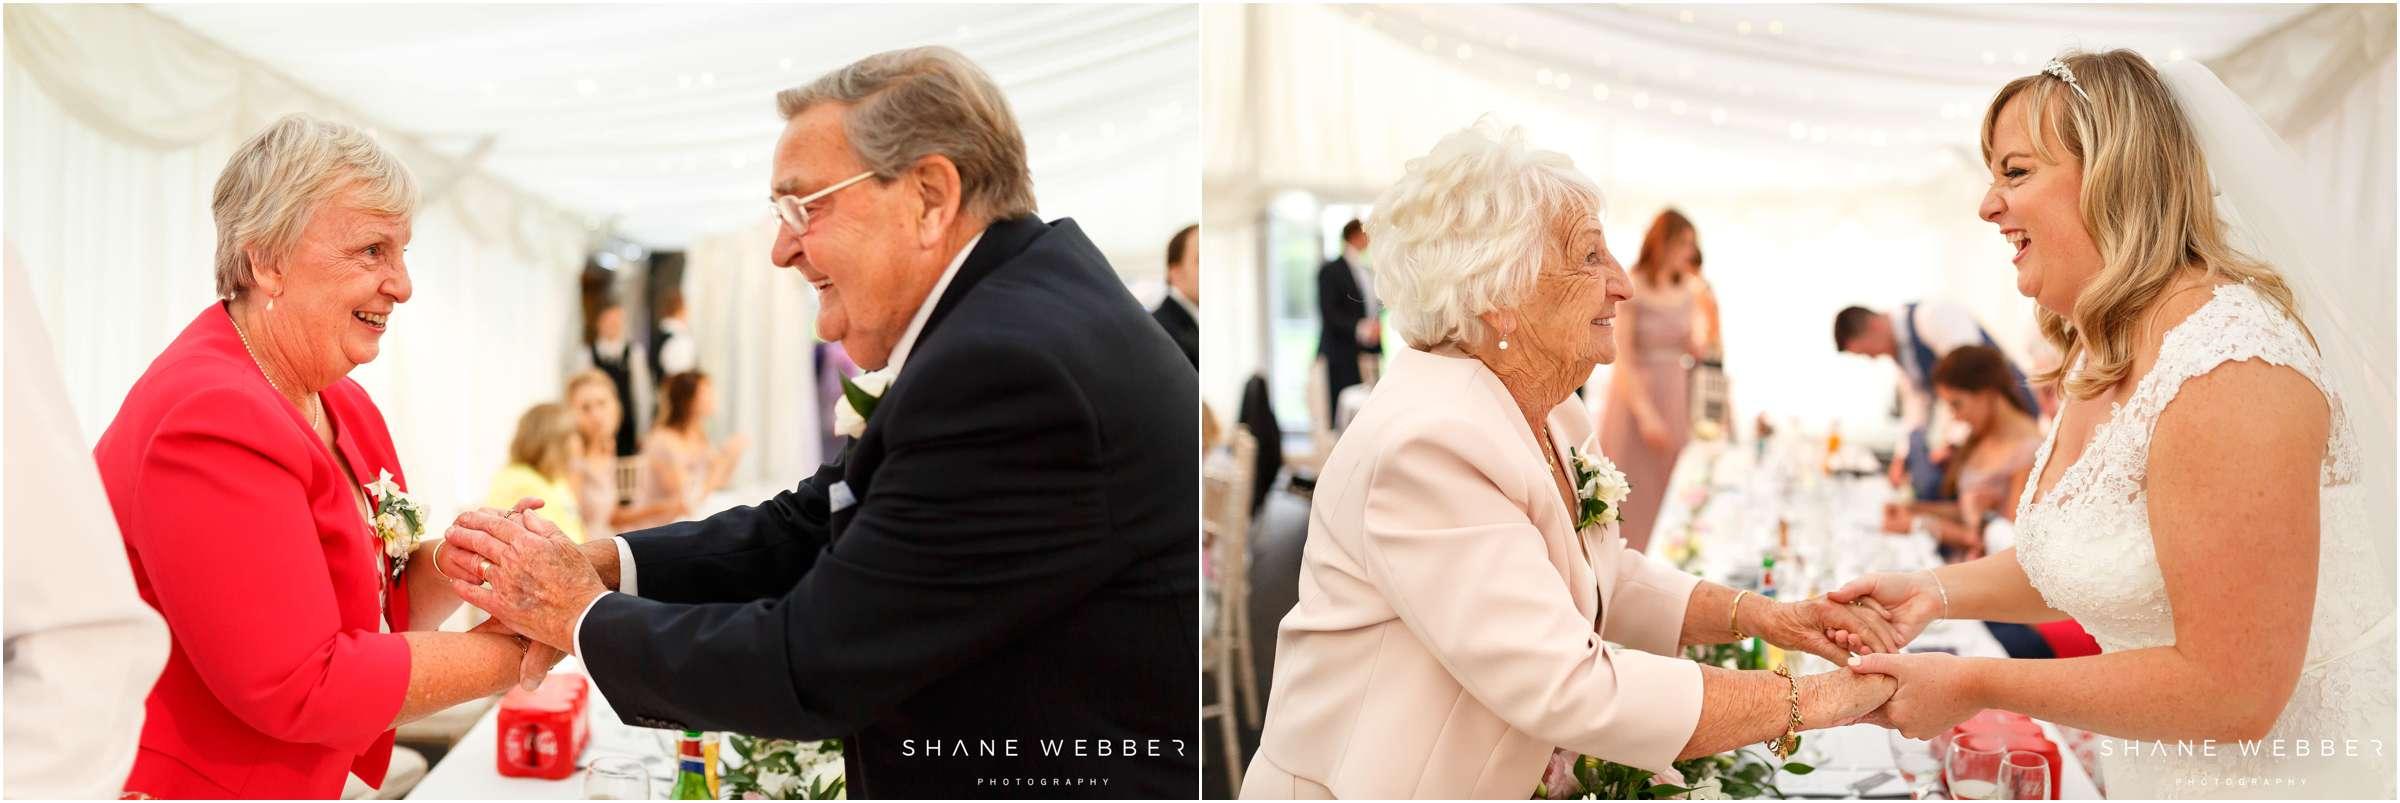 touching wedding moments